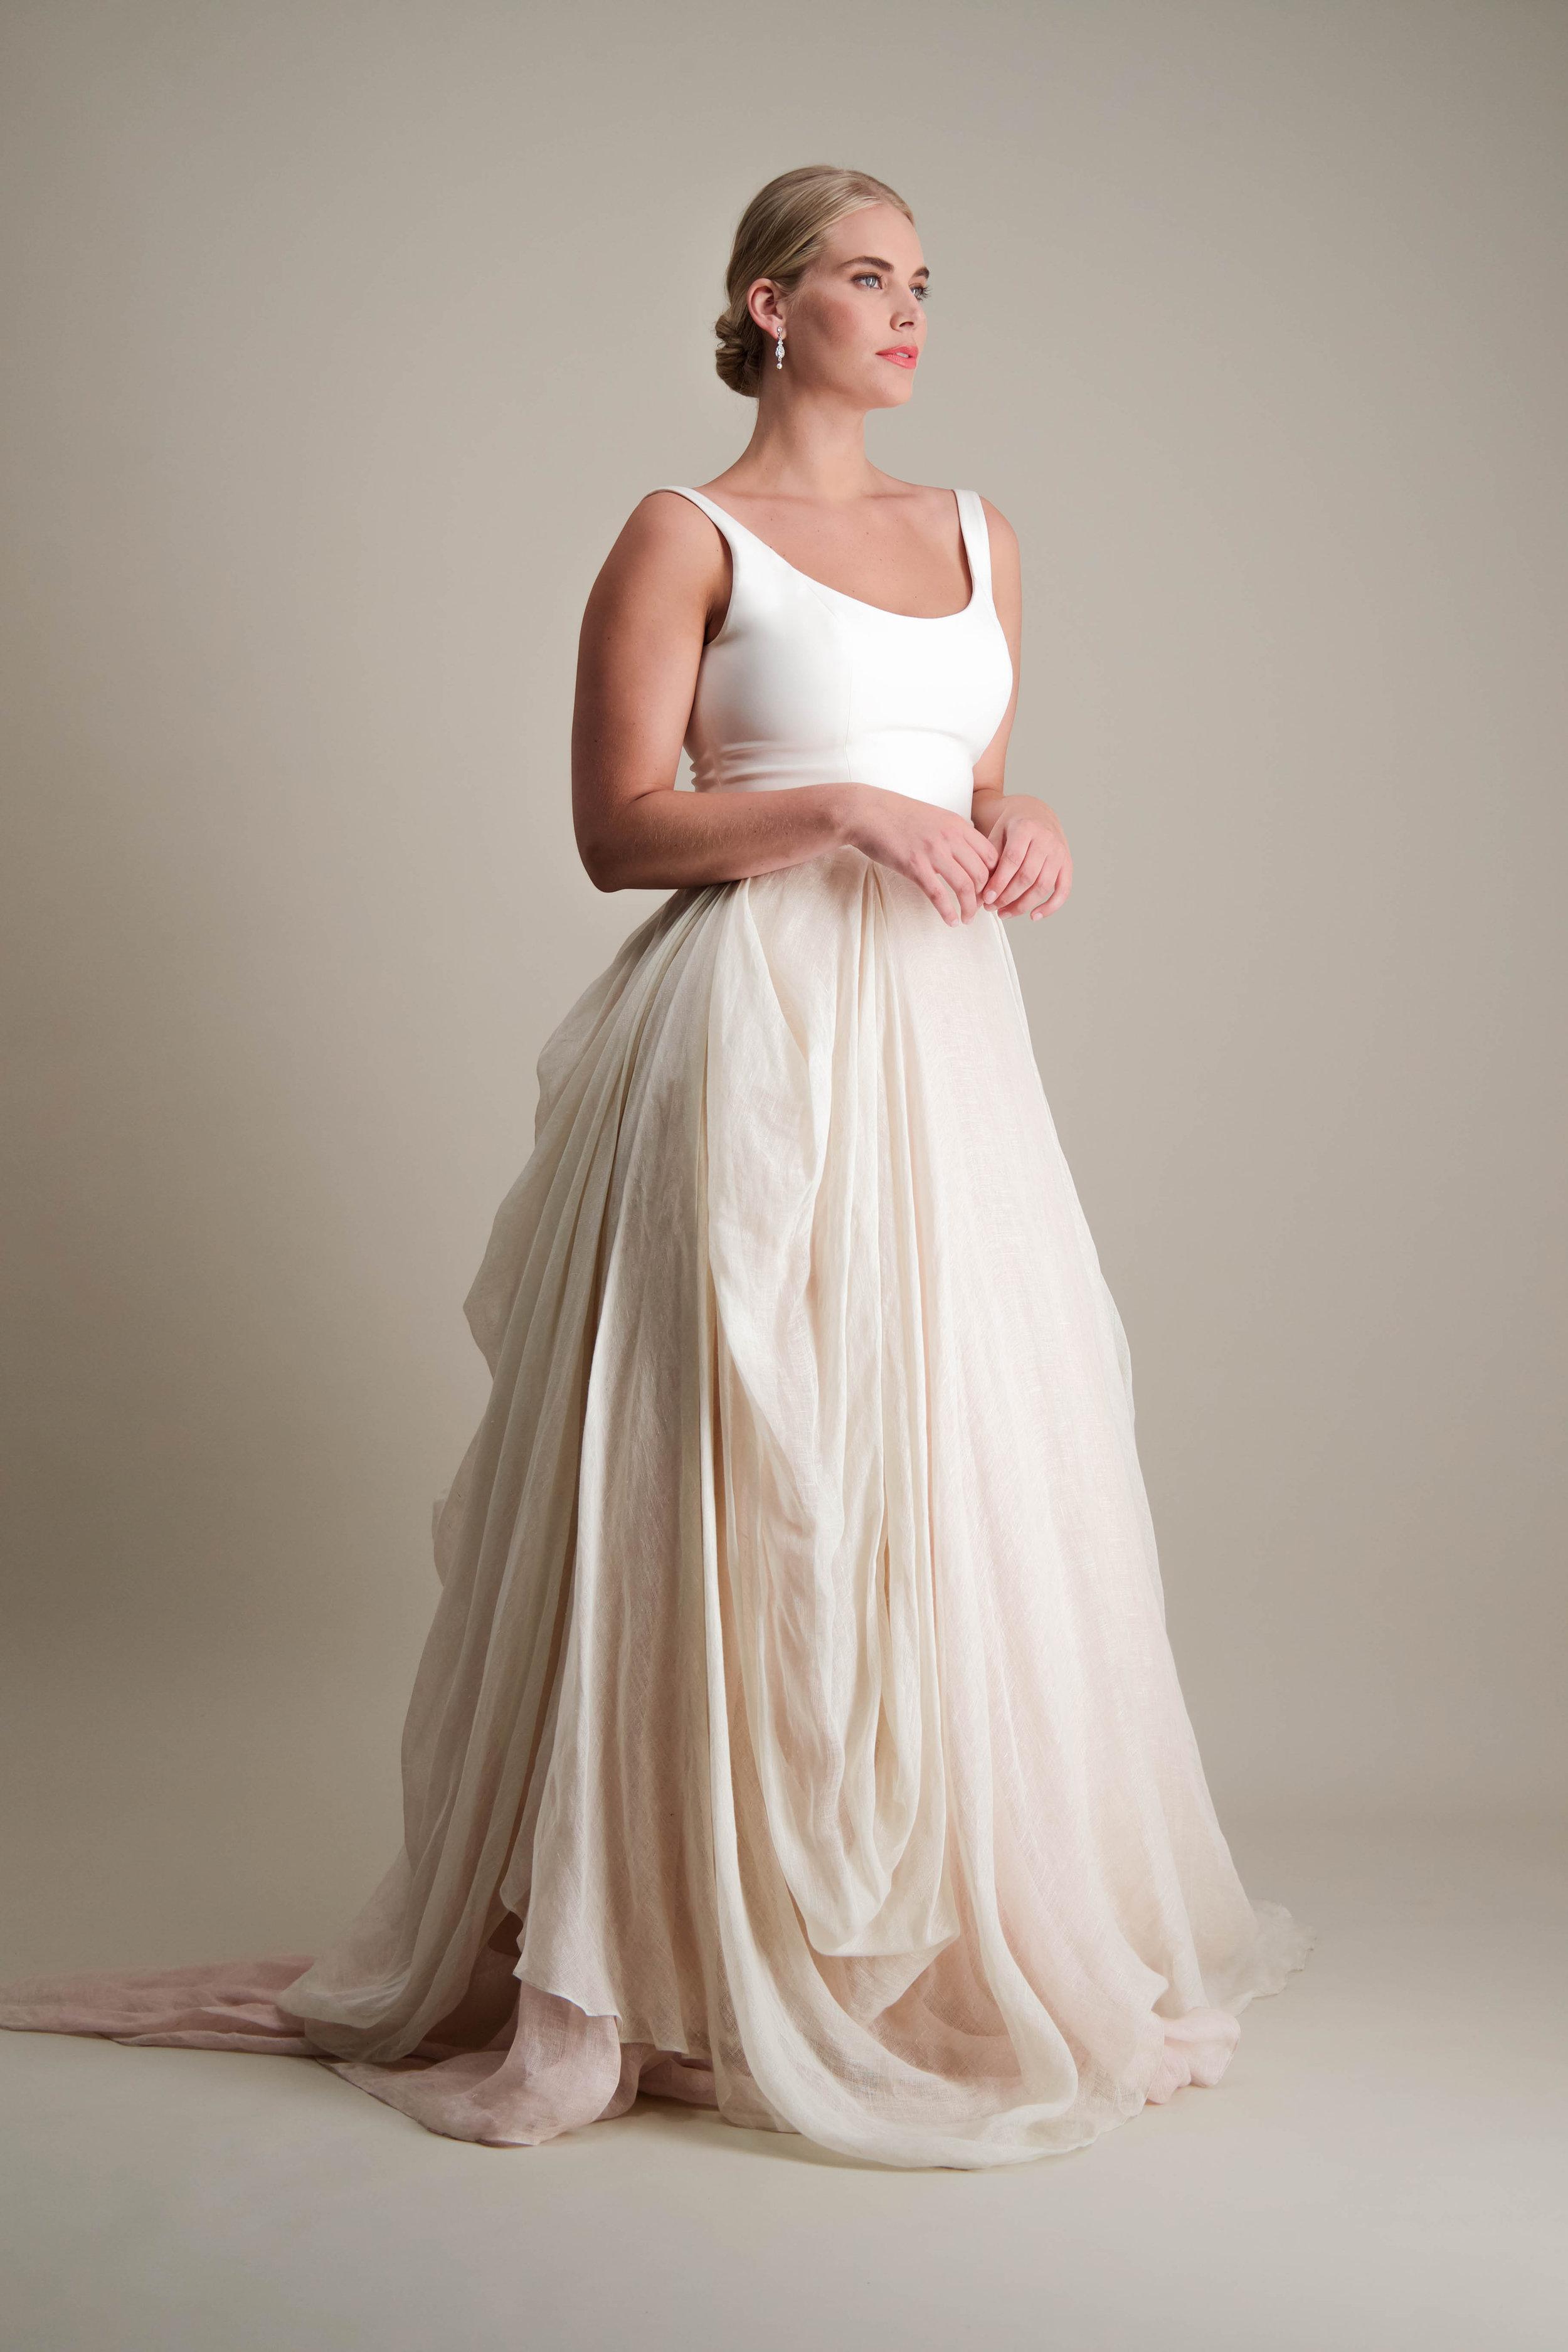 Kensington Skirt draped linen ball gown with scoop neck tank bodice 2.jpg